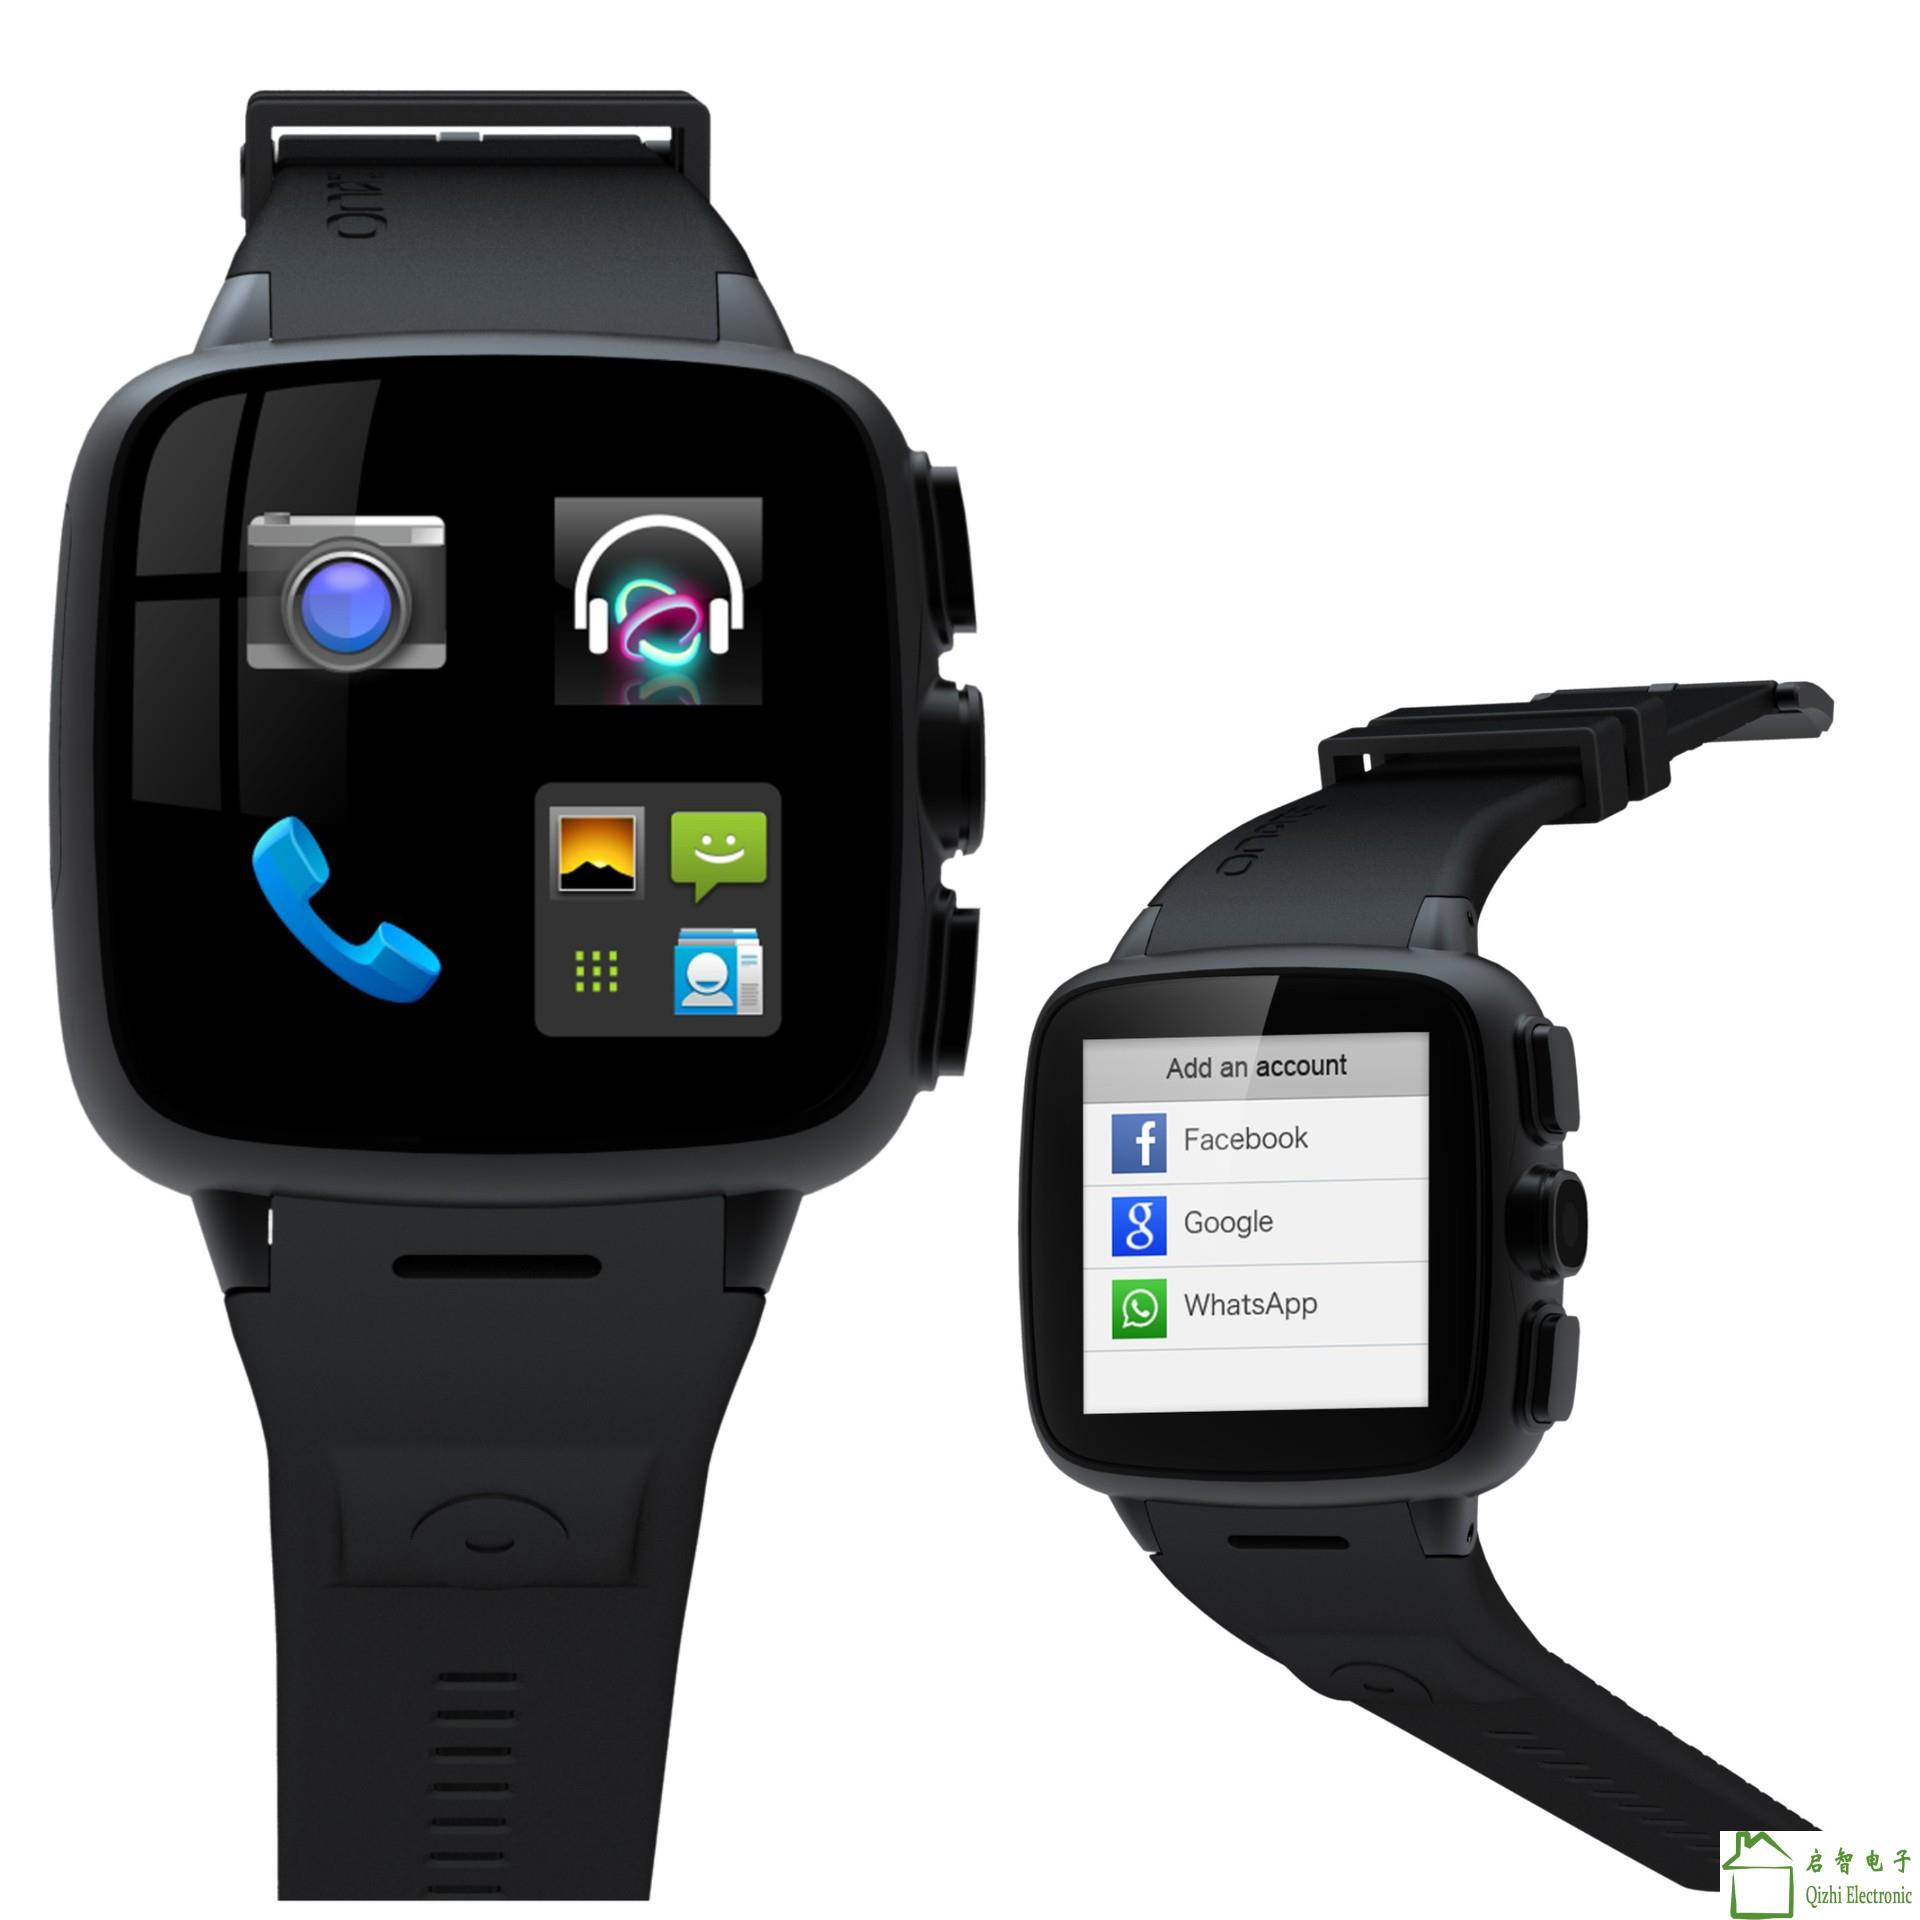 3G Waterproof Wear Smart Watch Phone Android WIFI Bluetooth Camera Dual Core Smartwatch Silicone Strap Smart phone Watch S23-2(China (Mainland))